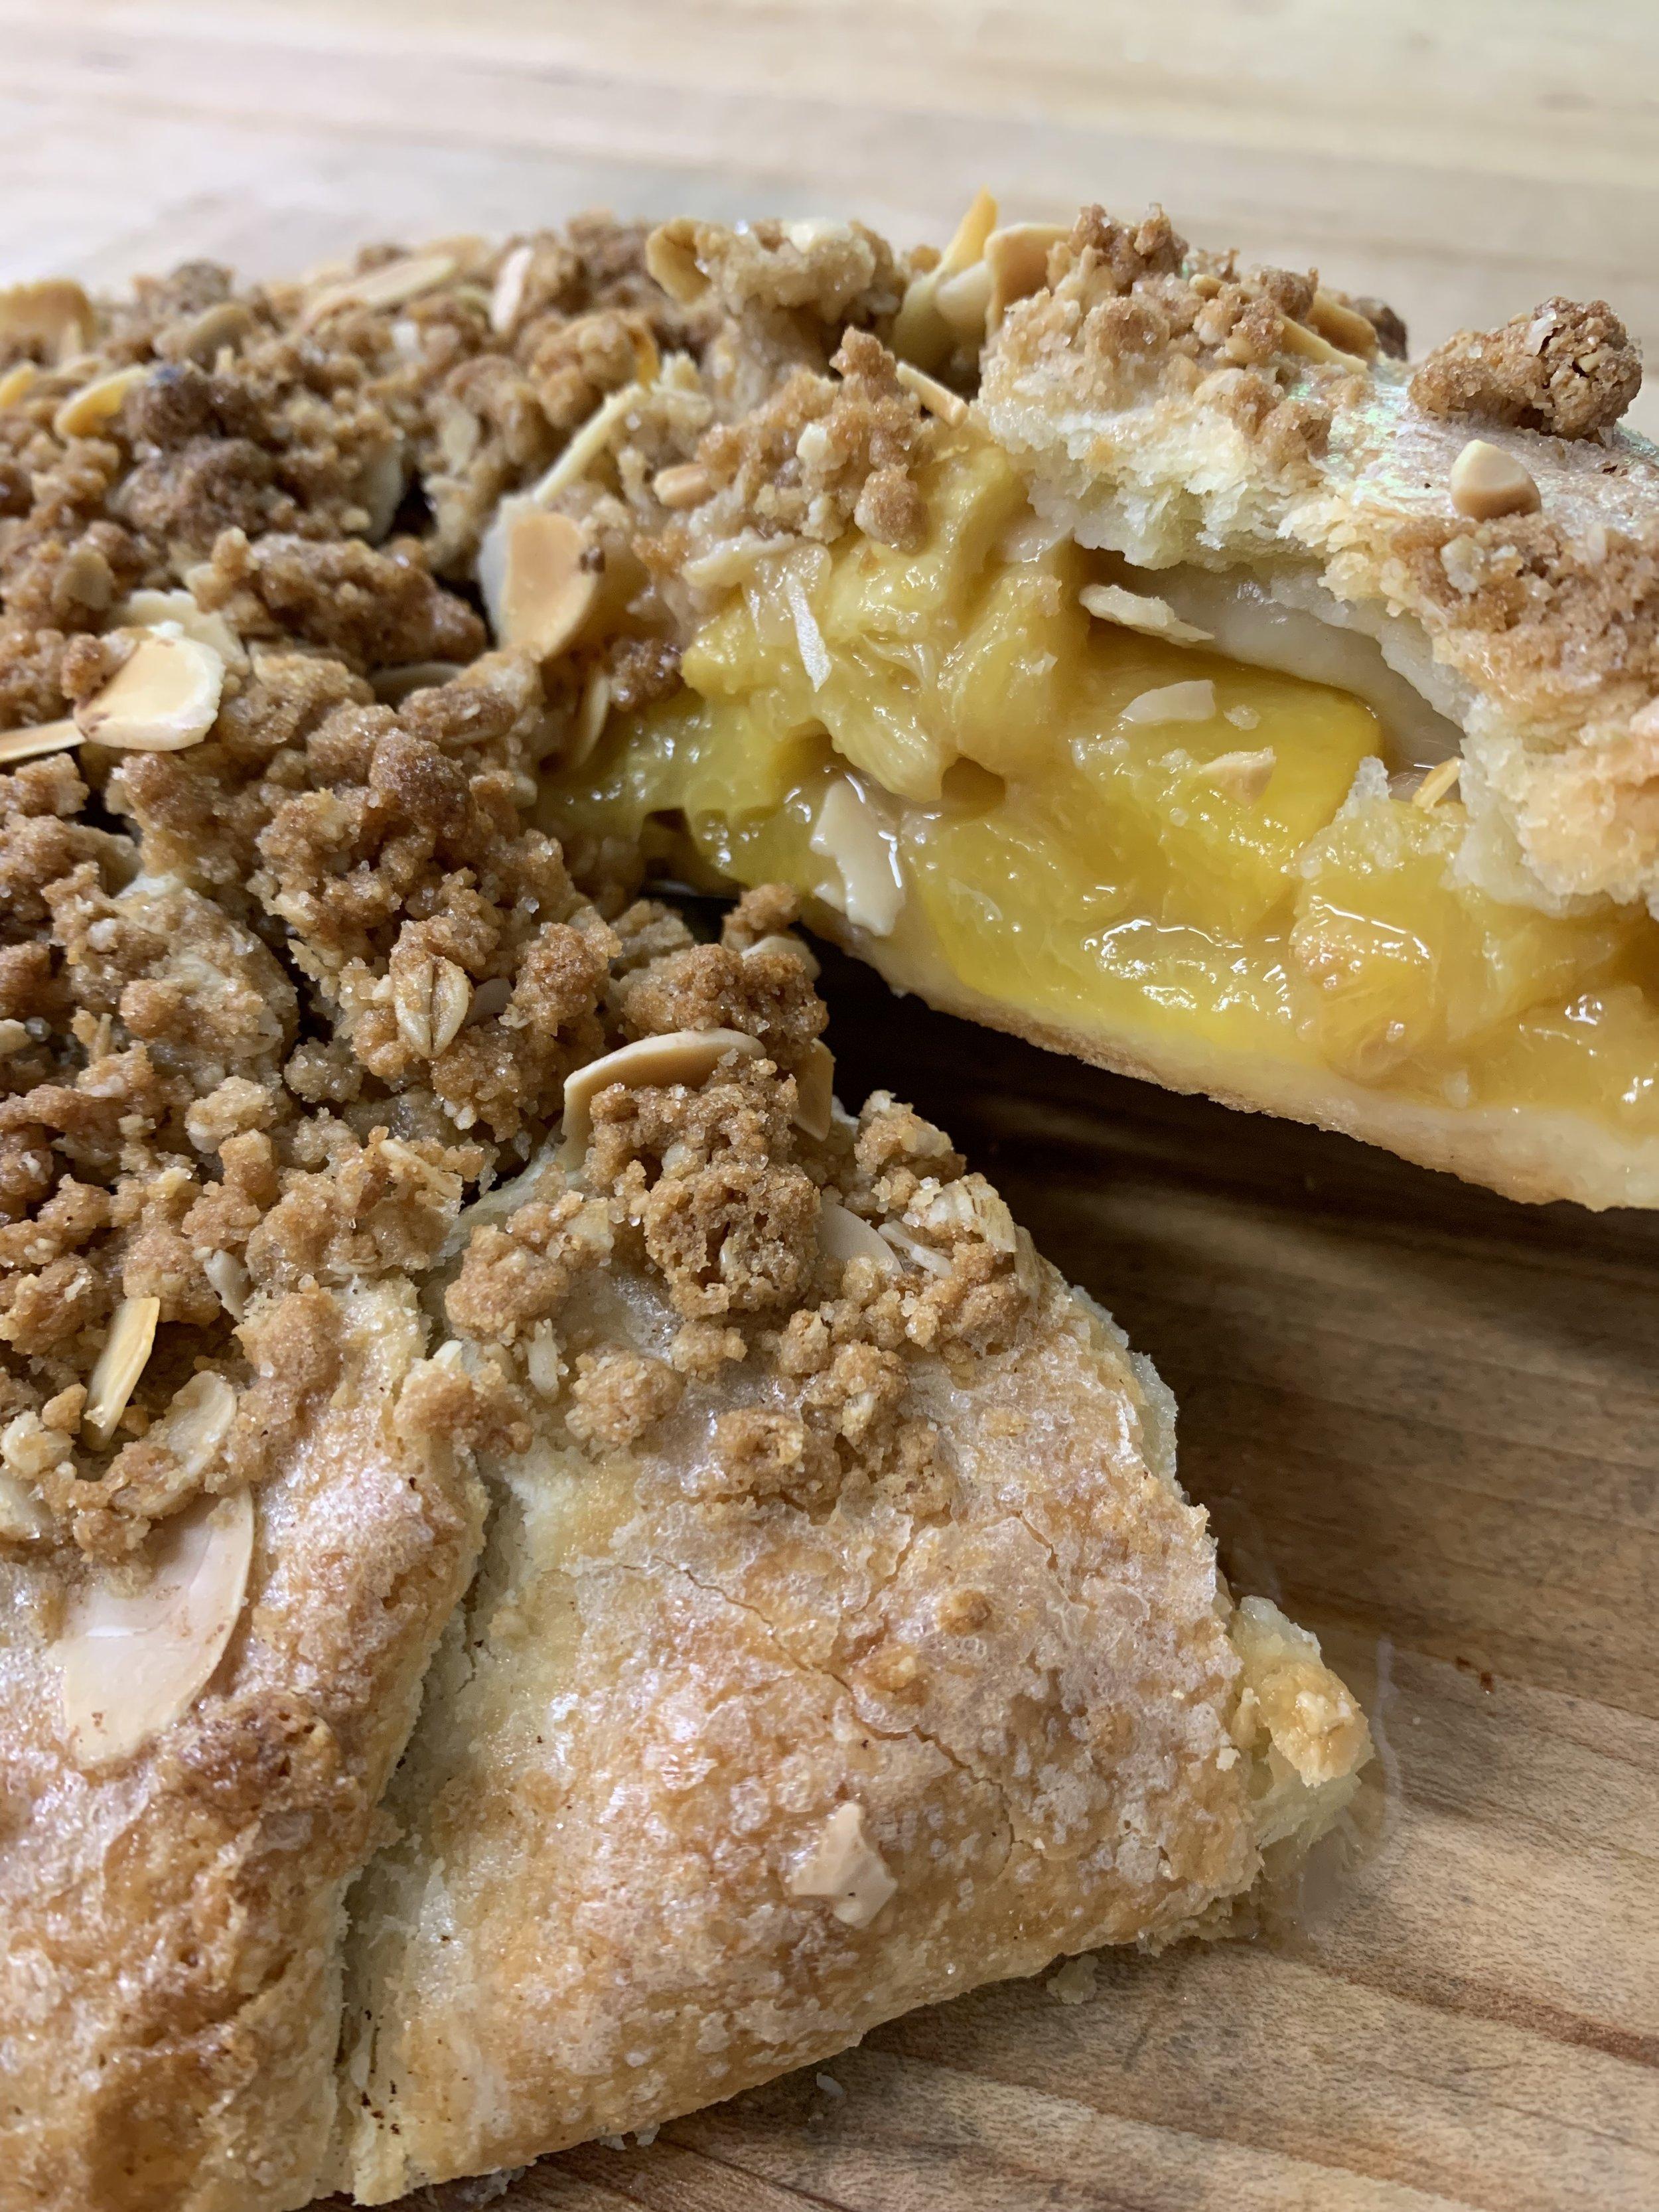 Peach Almond Crostata from Savour Cafe & Bakery